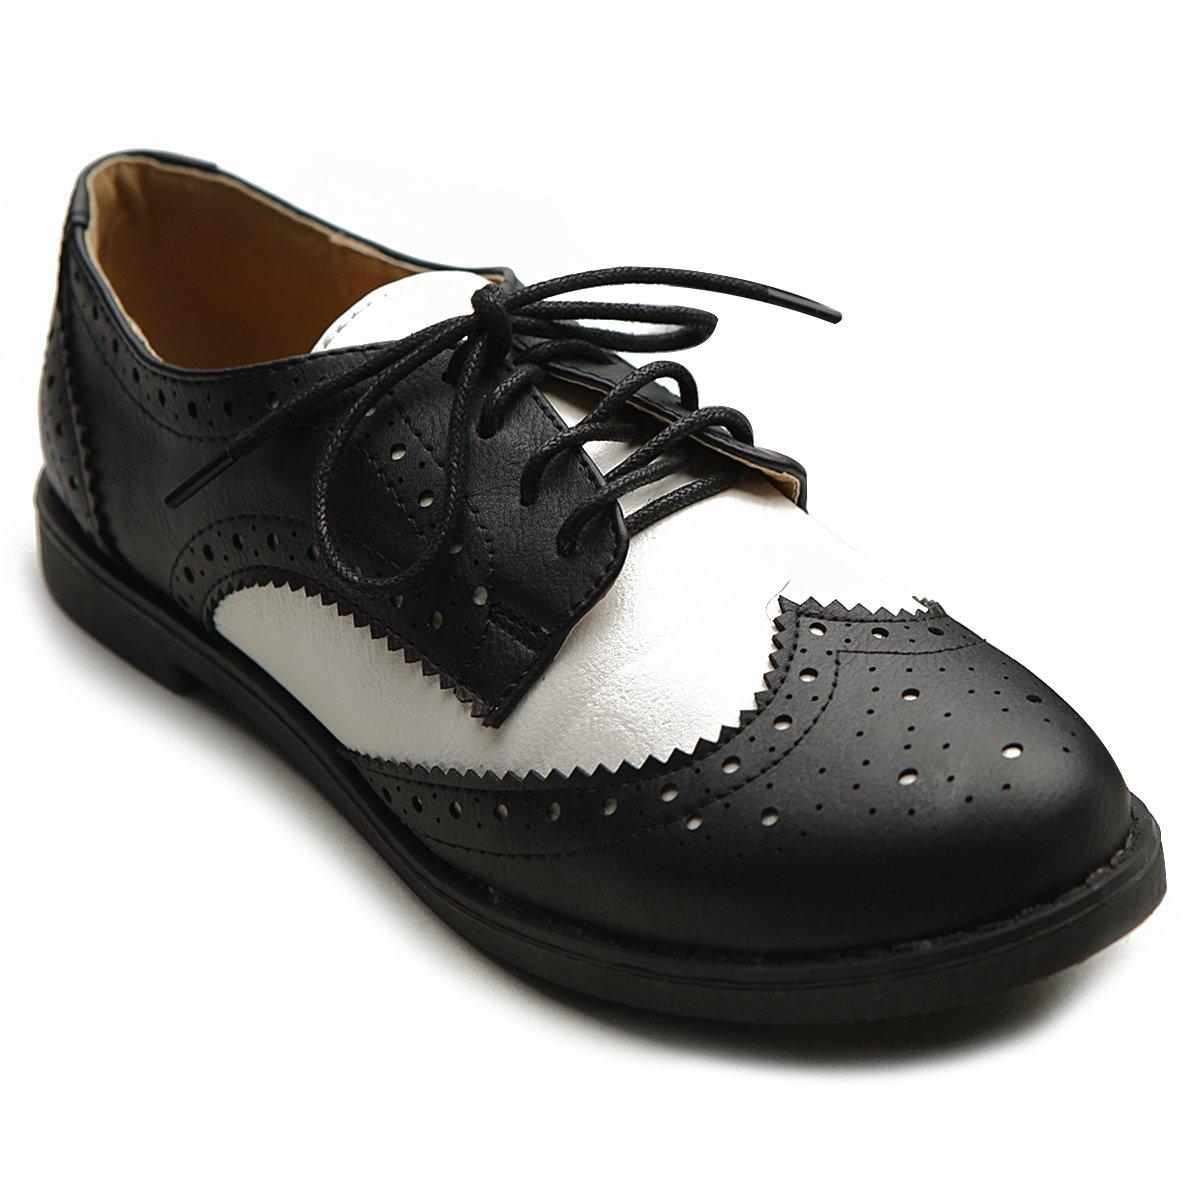 Ollio Women's Flat Shoe Wingtip Lace up Two Tone Oxford M2913(9 B(M) US, Black)